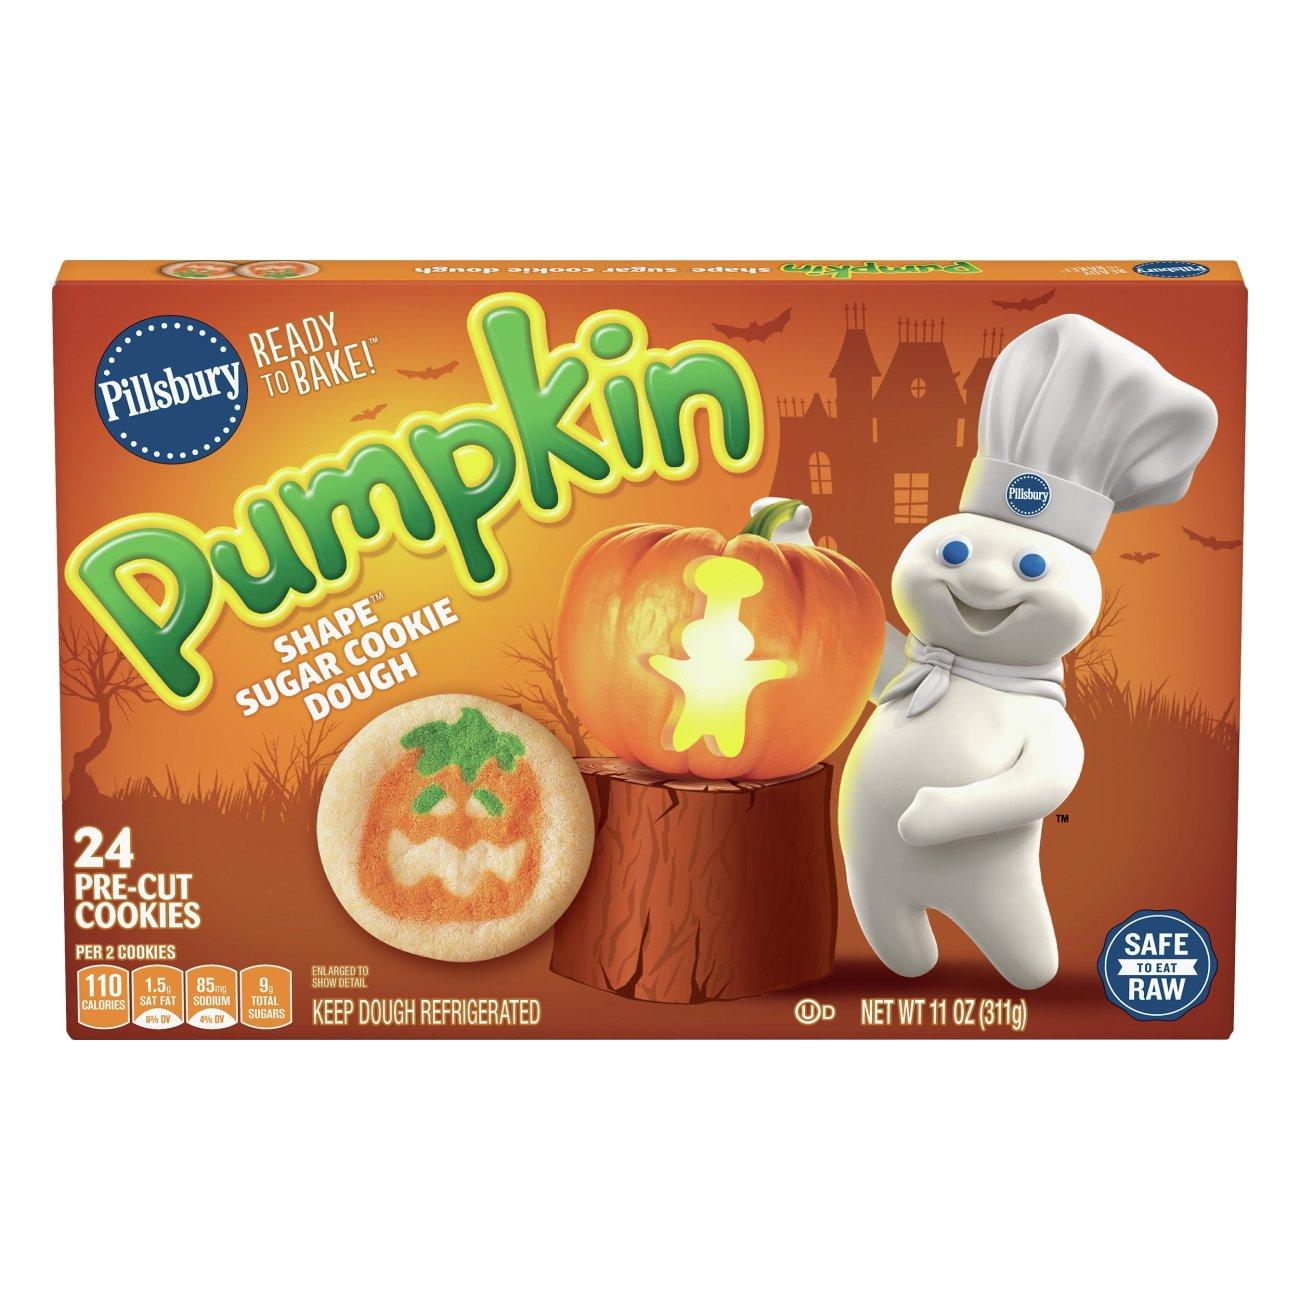 pillsbury ready to bake pumpkin shape sugar cookies shop cookie dough at heb